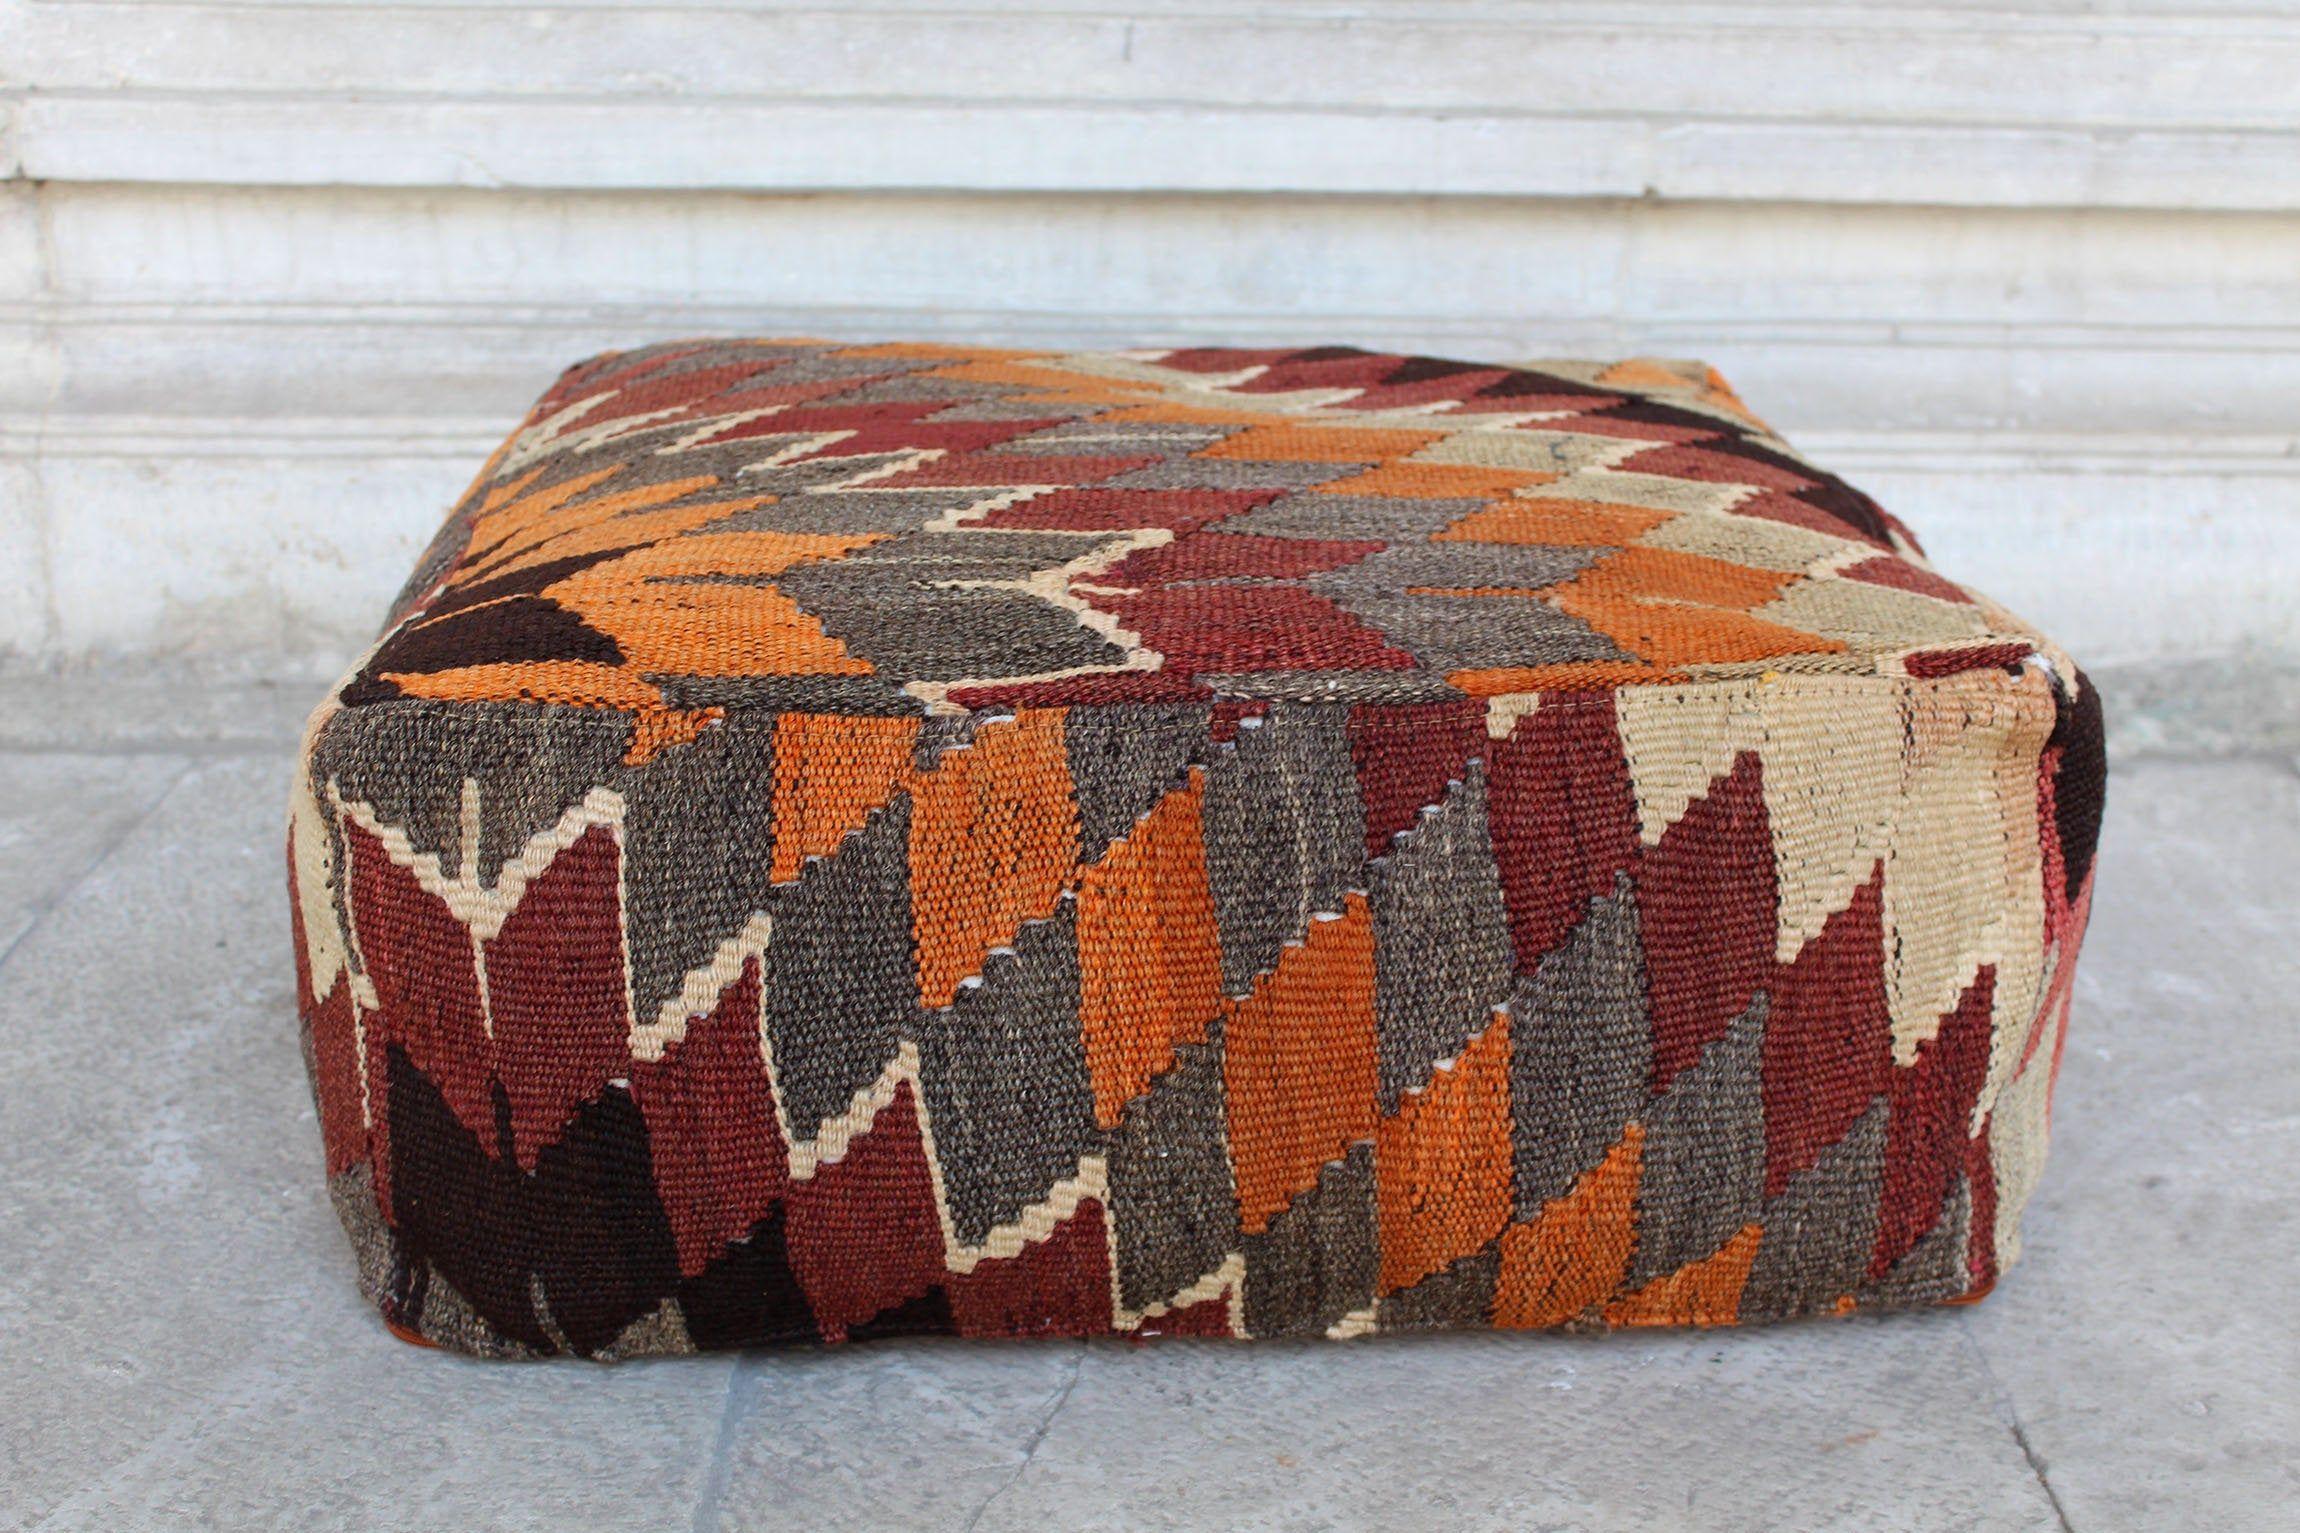 Vintage Boho Kilim Rug Upholstered Benches Stools Ottomans A Pair